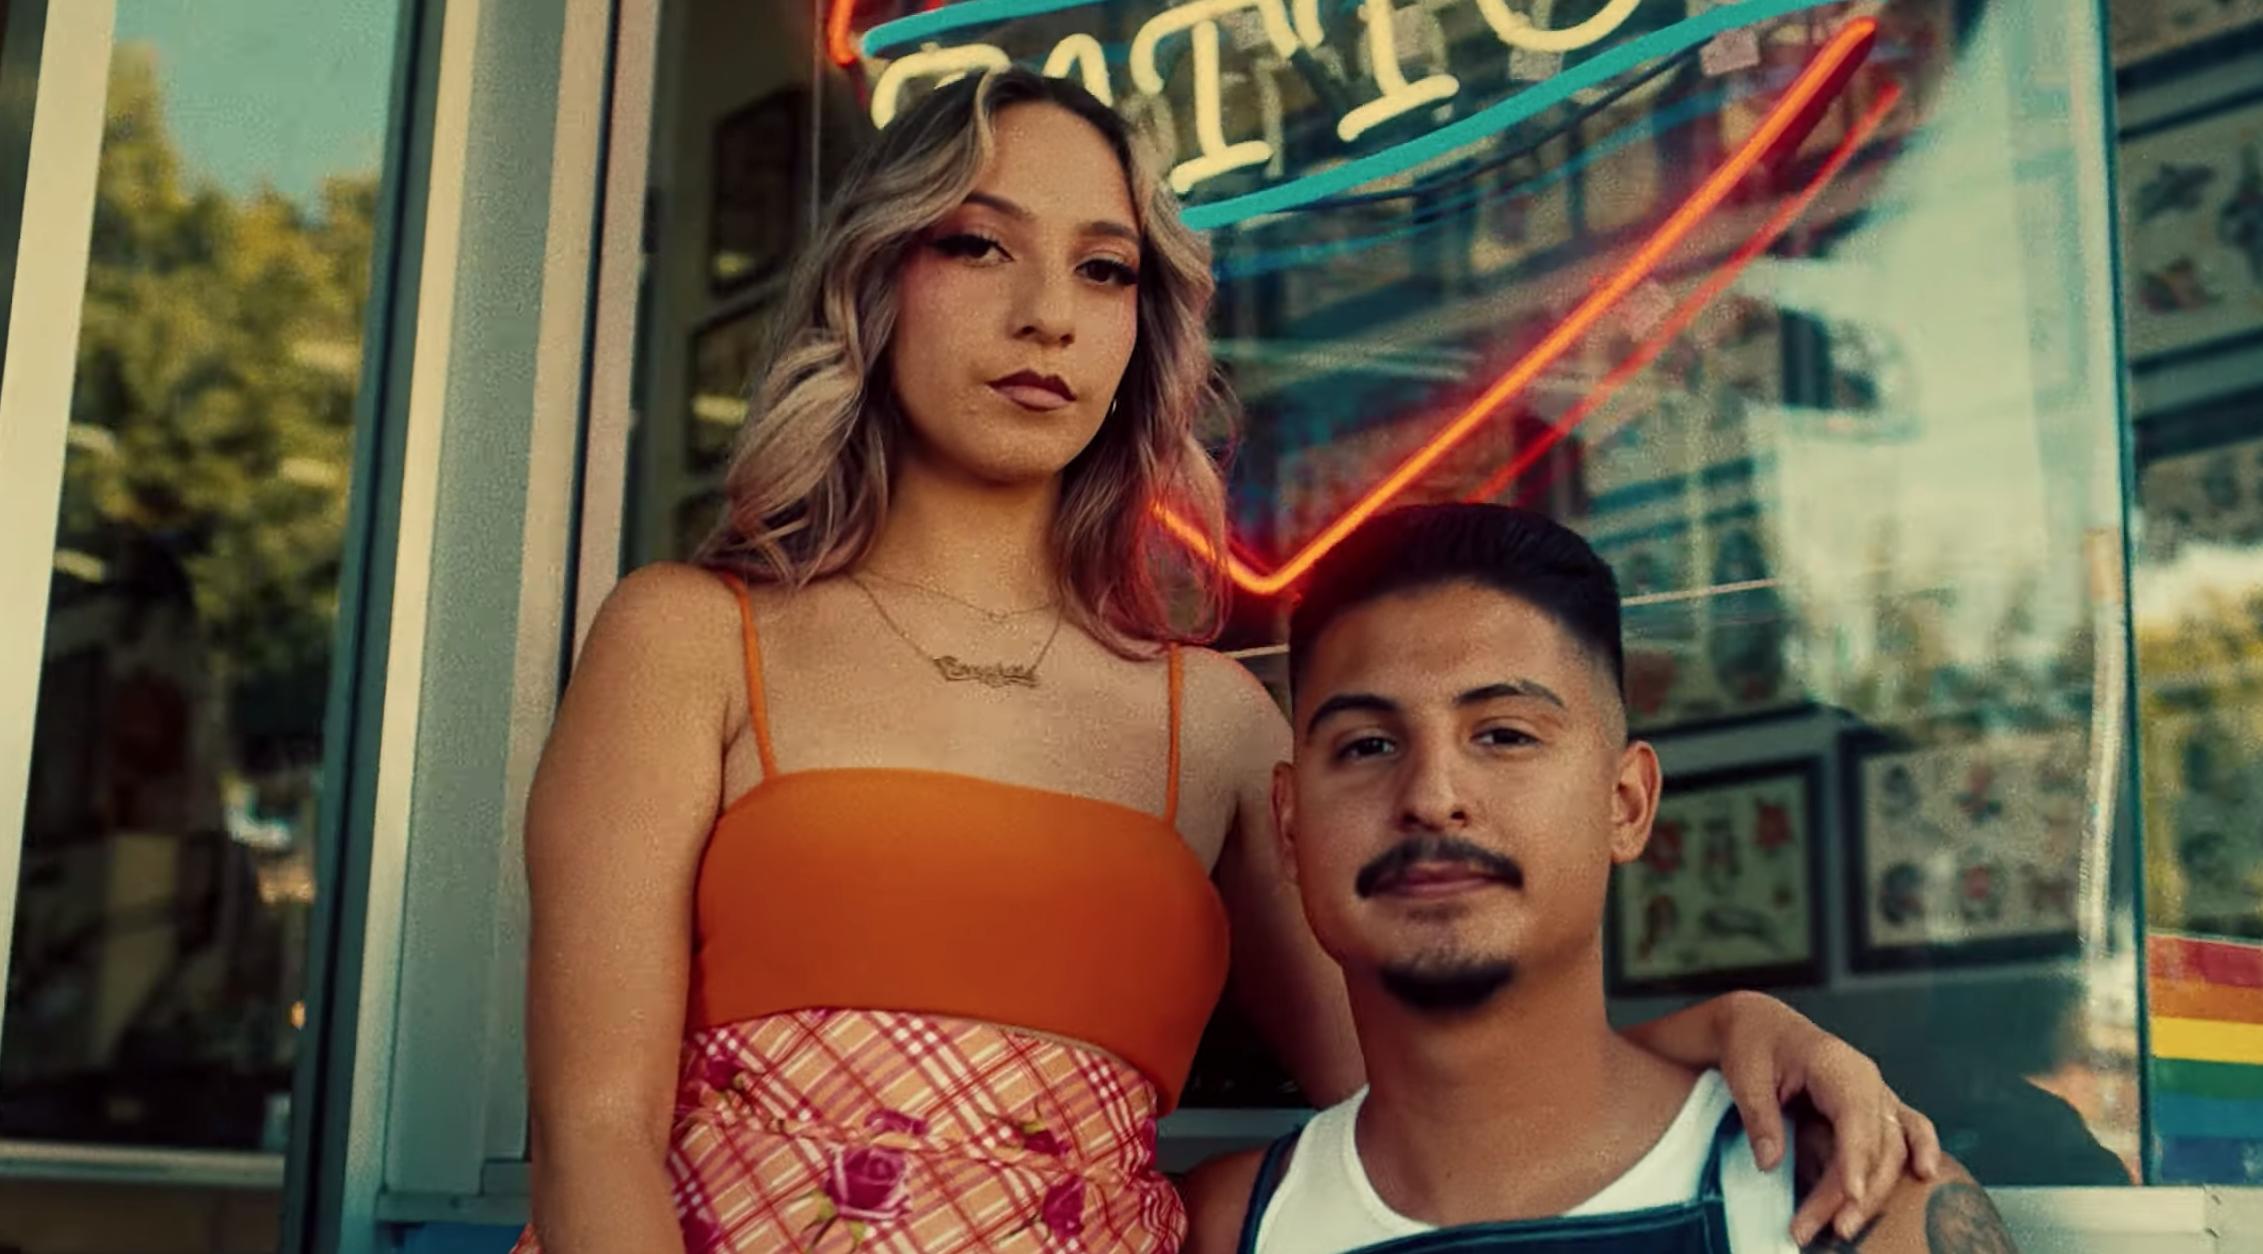 Los Ángeles Lindo y Querido is a Stunning Look at LA Through the Eyes of 3 Mexican-American Bands